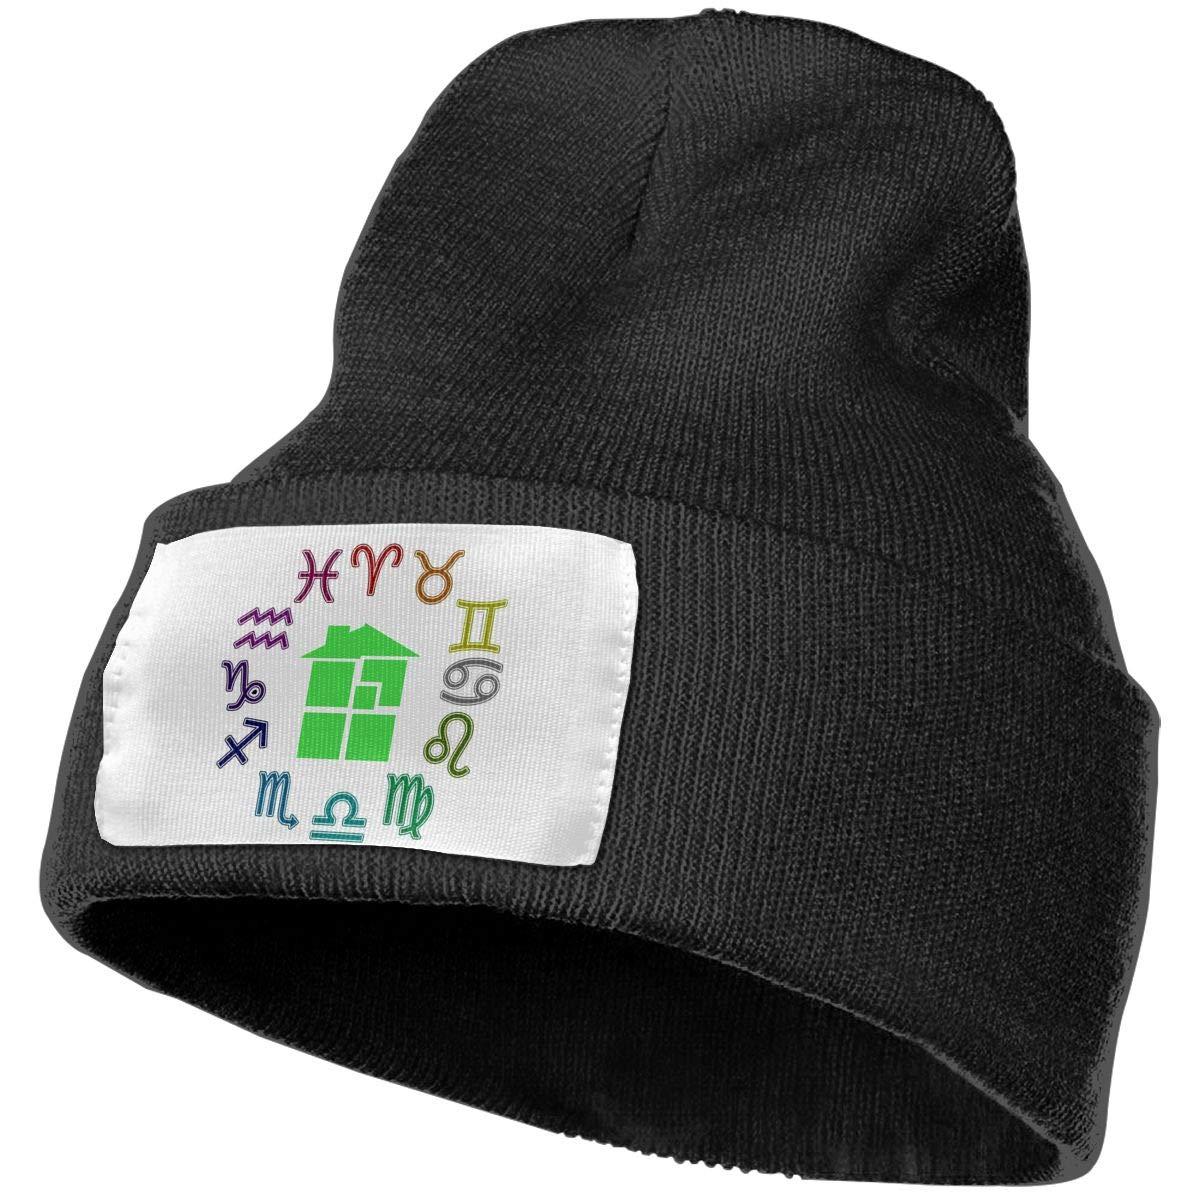 Unisex Winter Hats Homestuck Symbol Skull Caps Knit Hat Cap Beanie Cap for Men//Womens